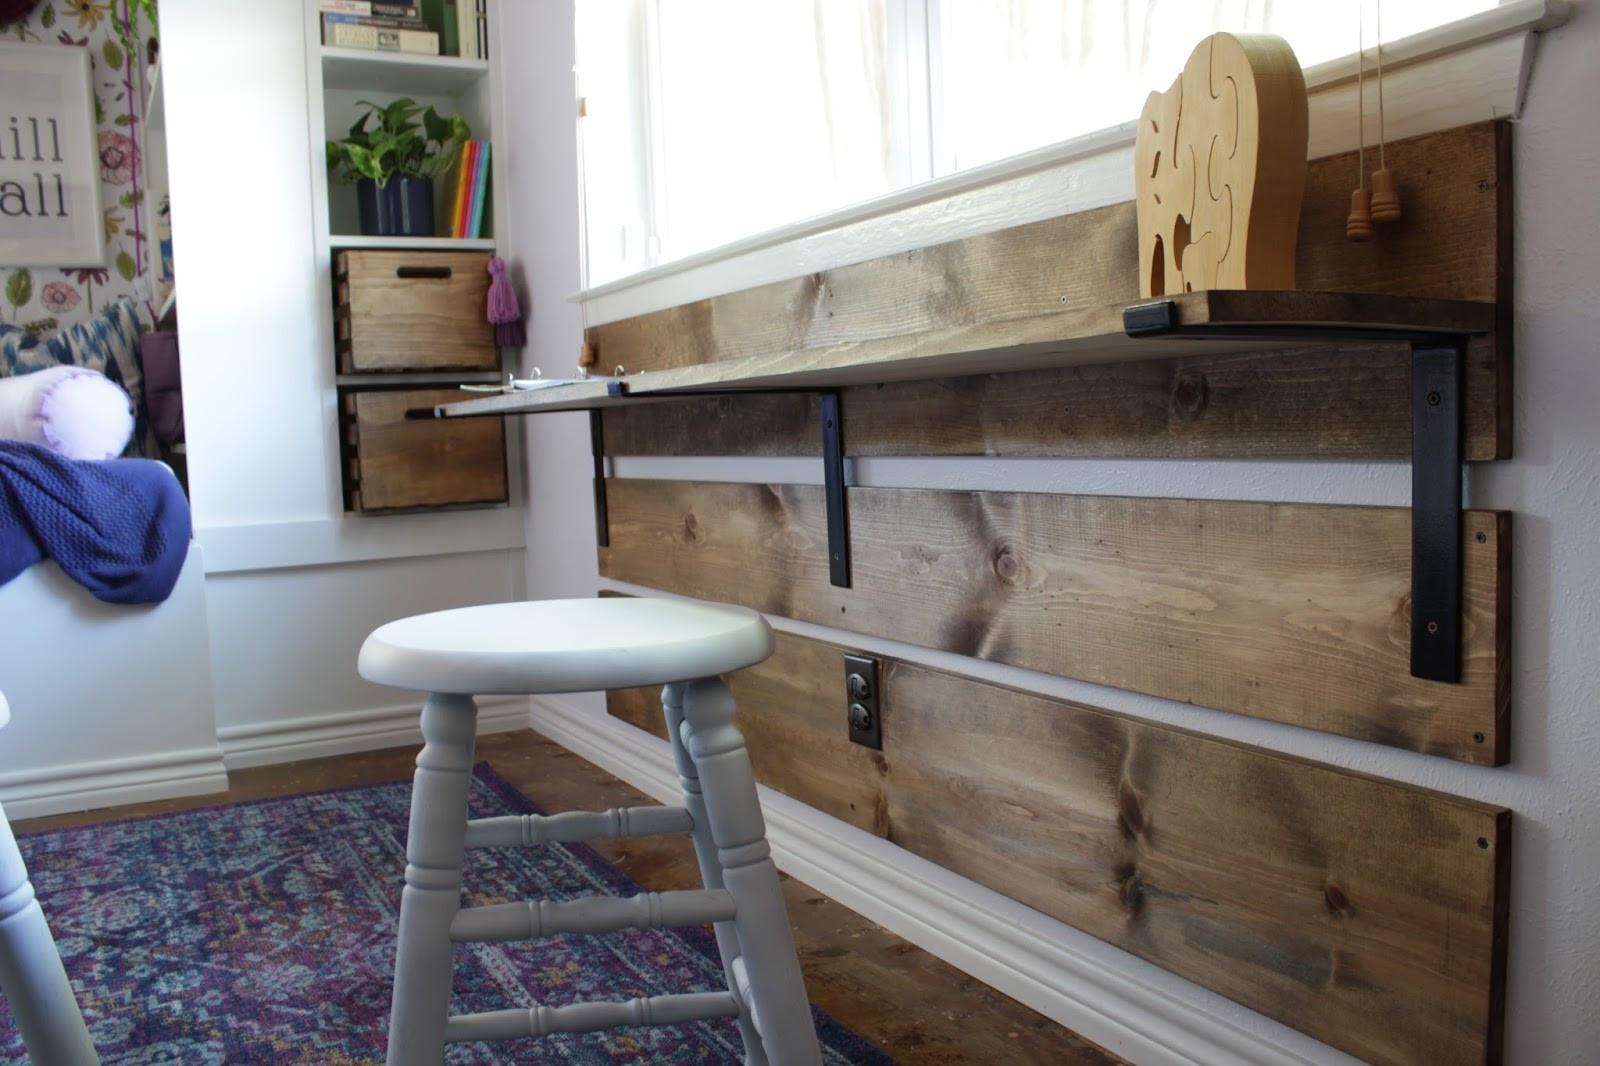 Best ideas about DIY Shelf Bracket . Save or Pin House Homemade DIY Kids Desk with Shelf Brackets Now.